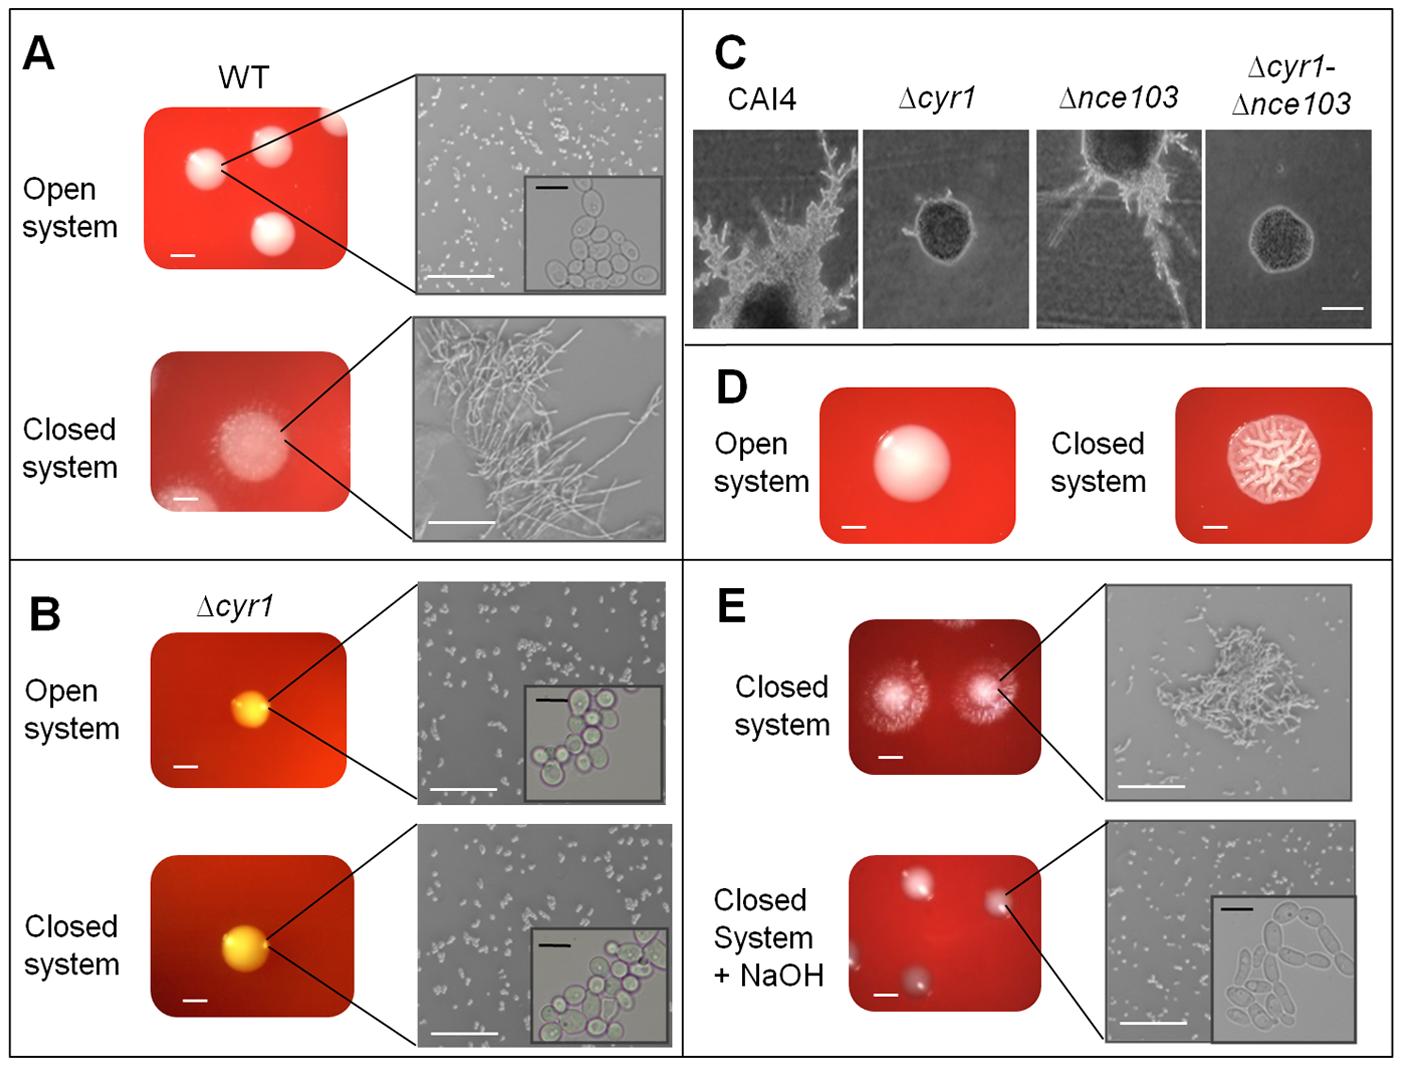 CO<sub>2</sub> affects <i>C. albicans</i> colony morphology.